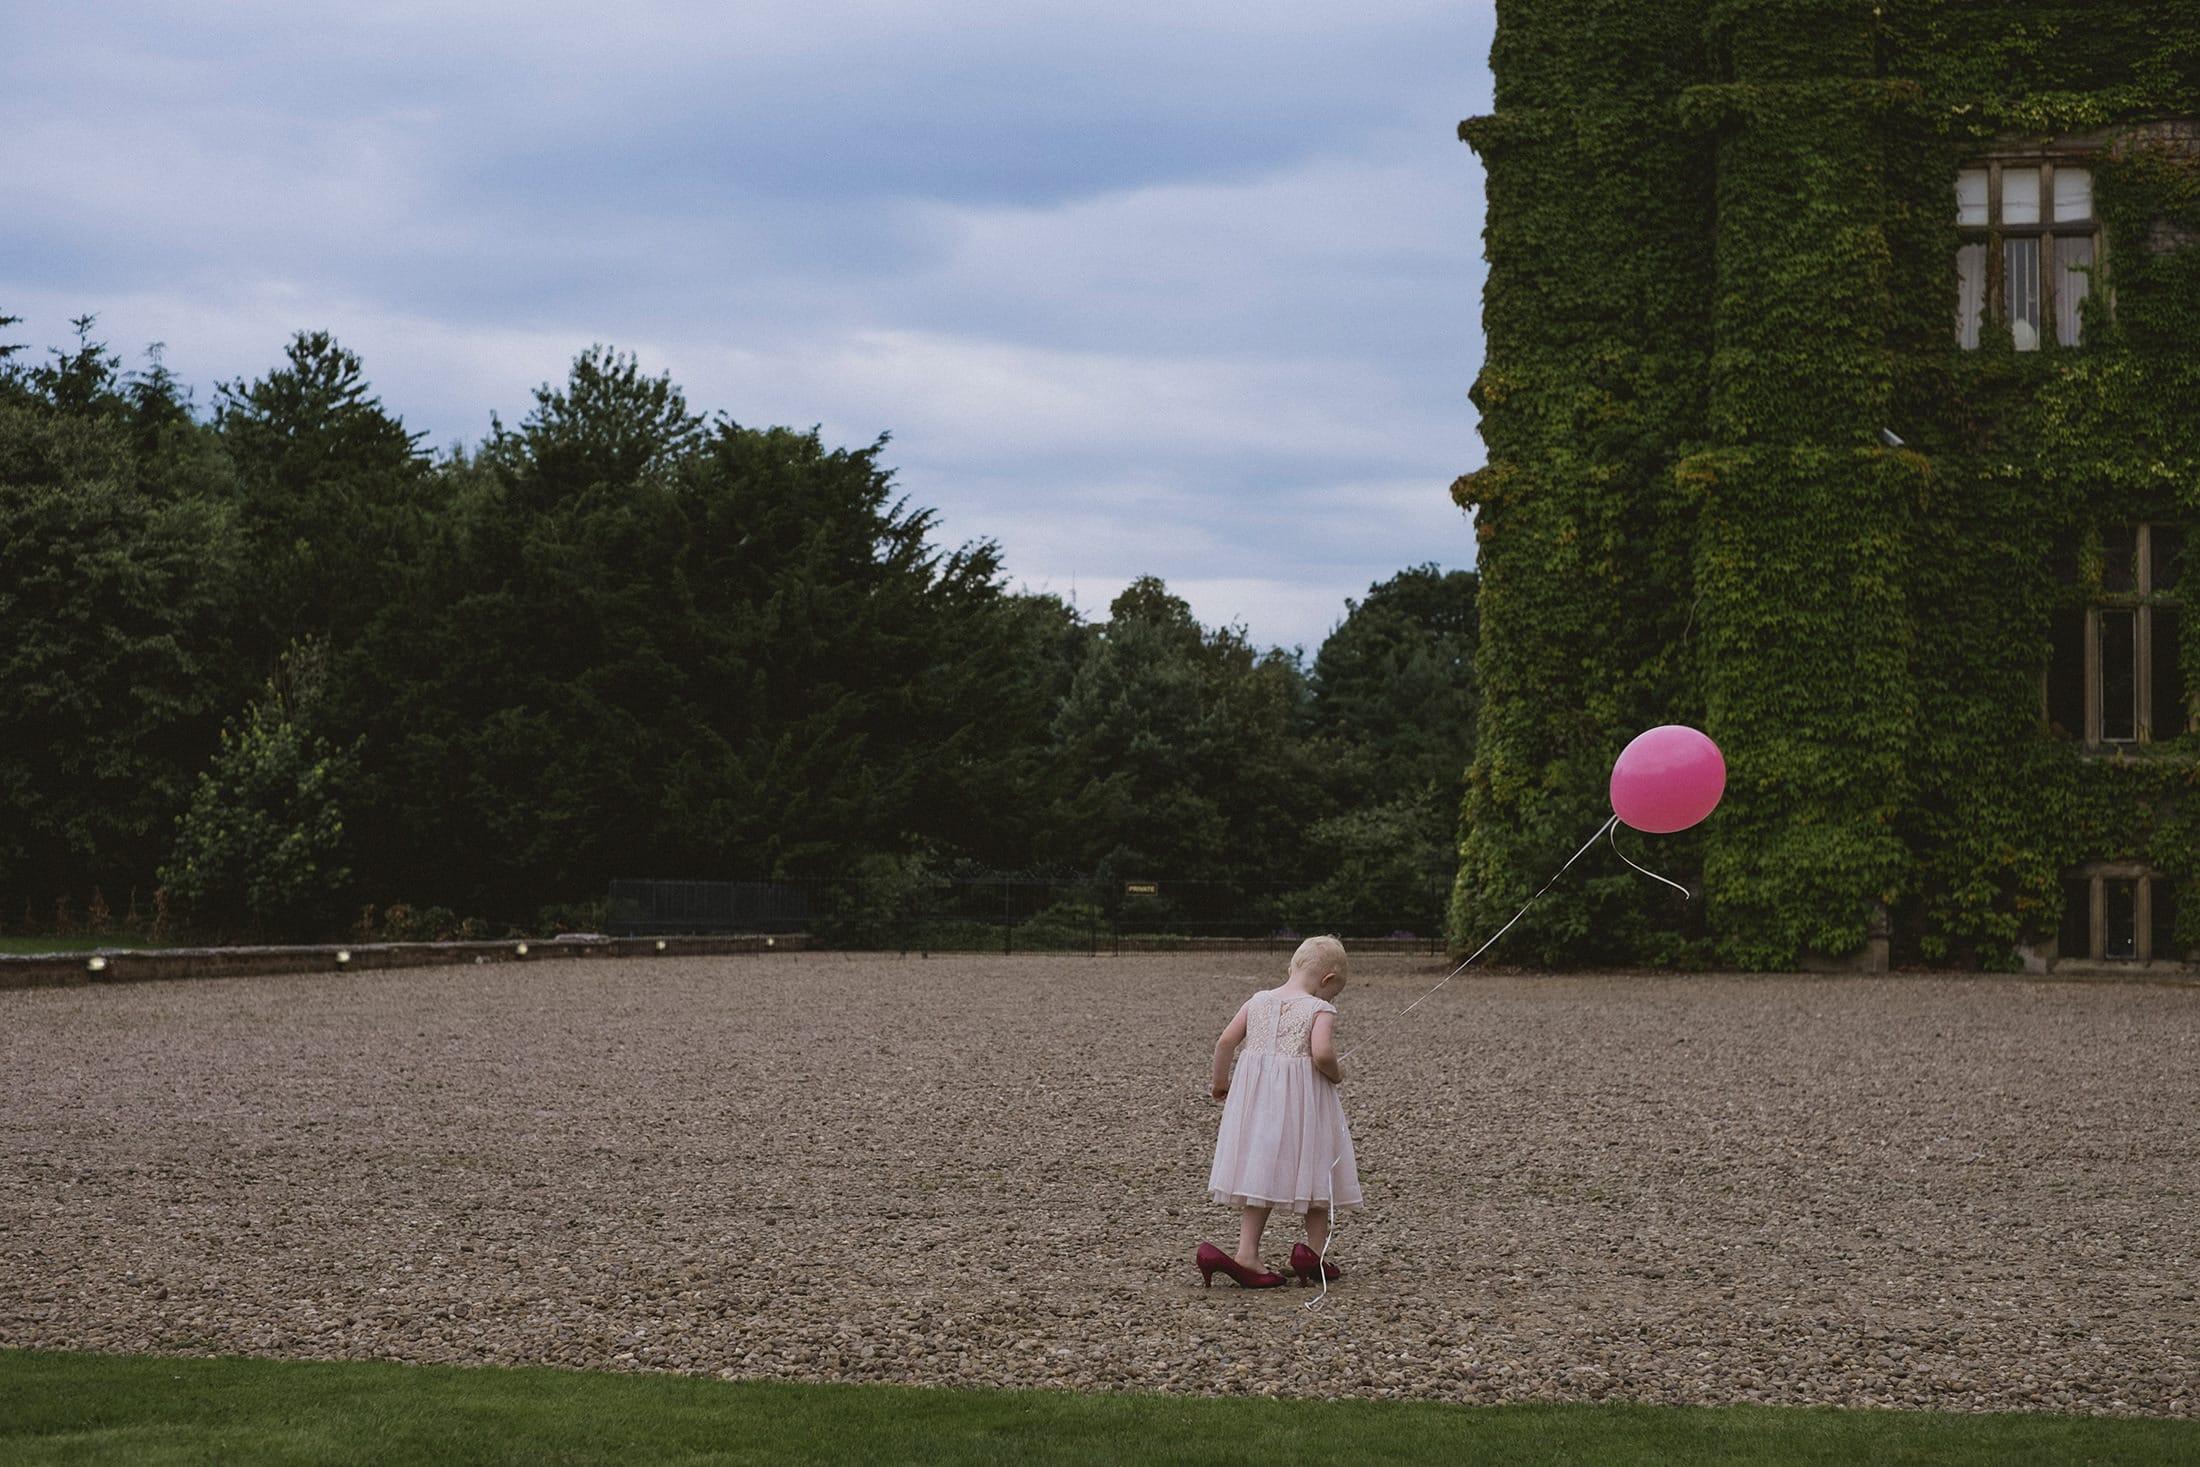 little girl in pink dress walking in high heels holding a balloon